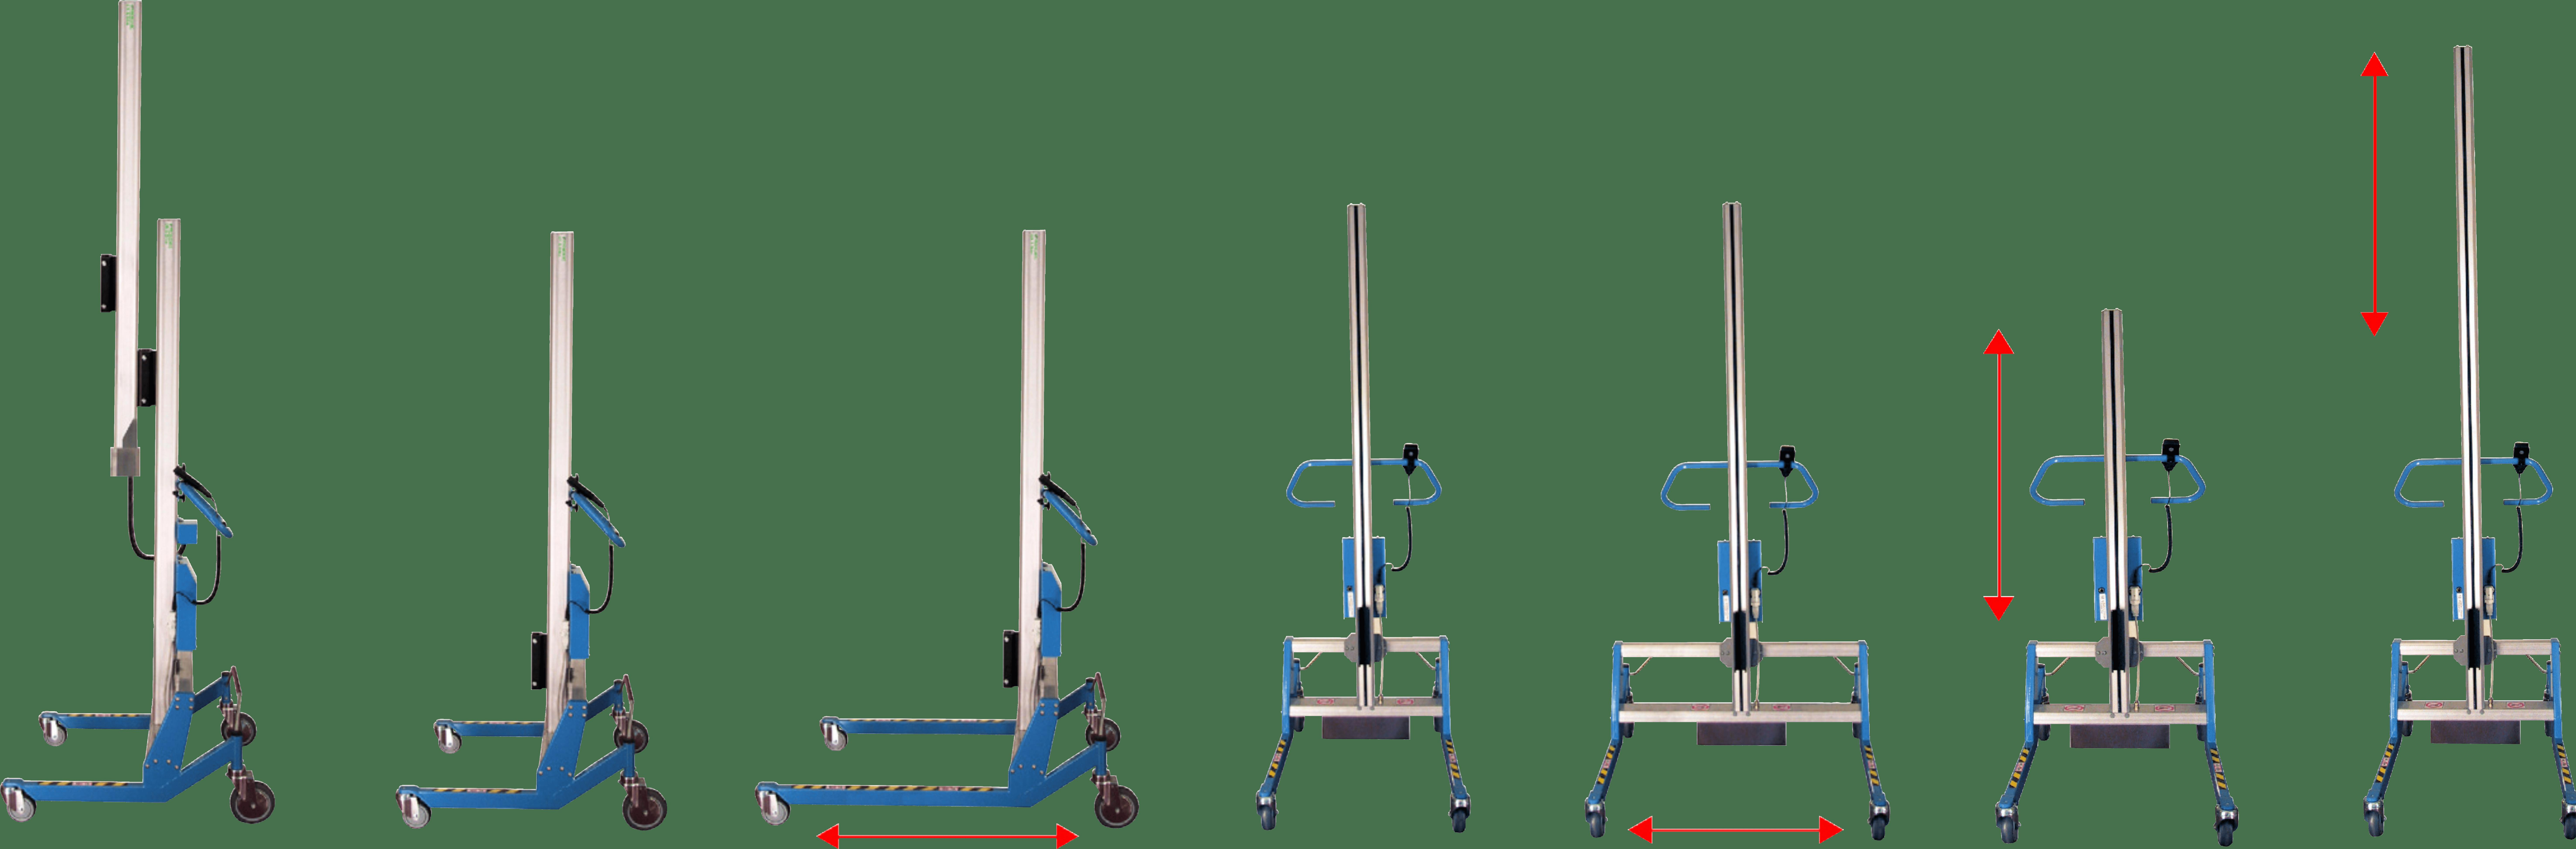 Pronomic Lifting Trolley modular construction